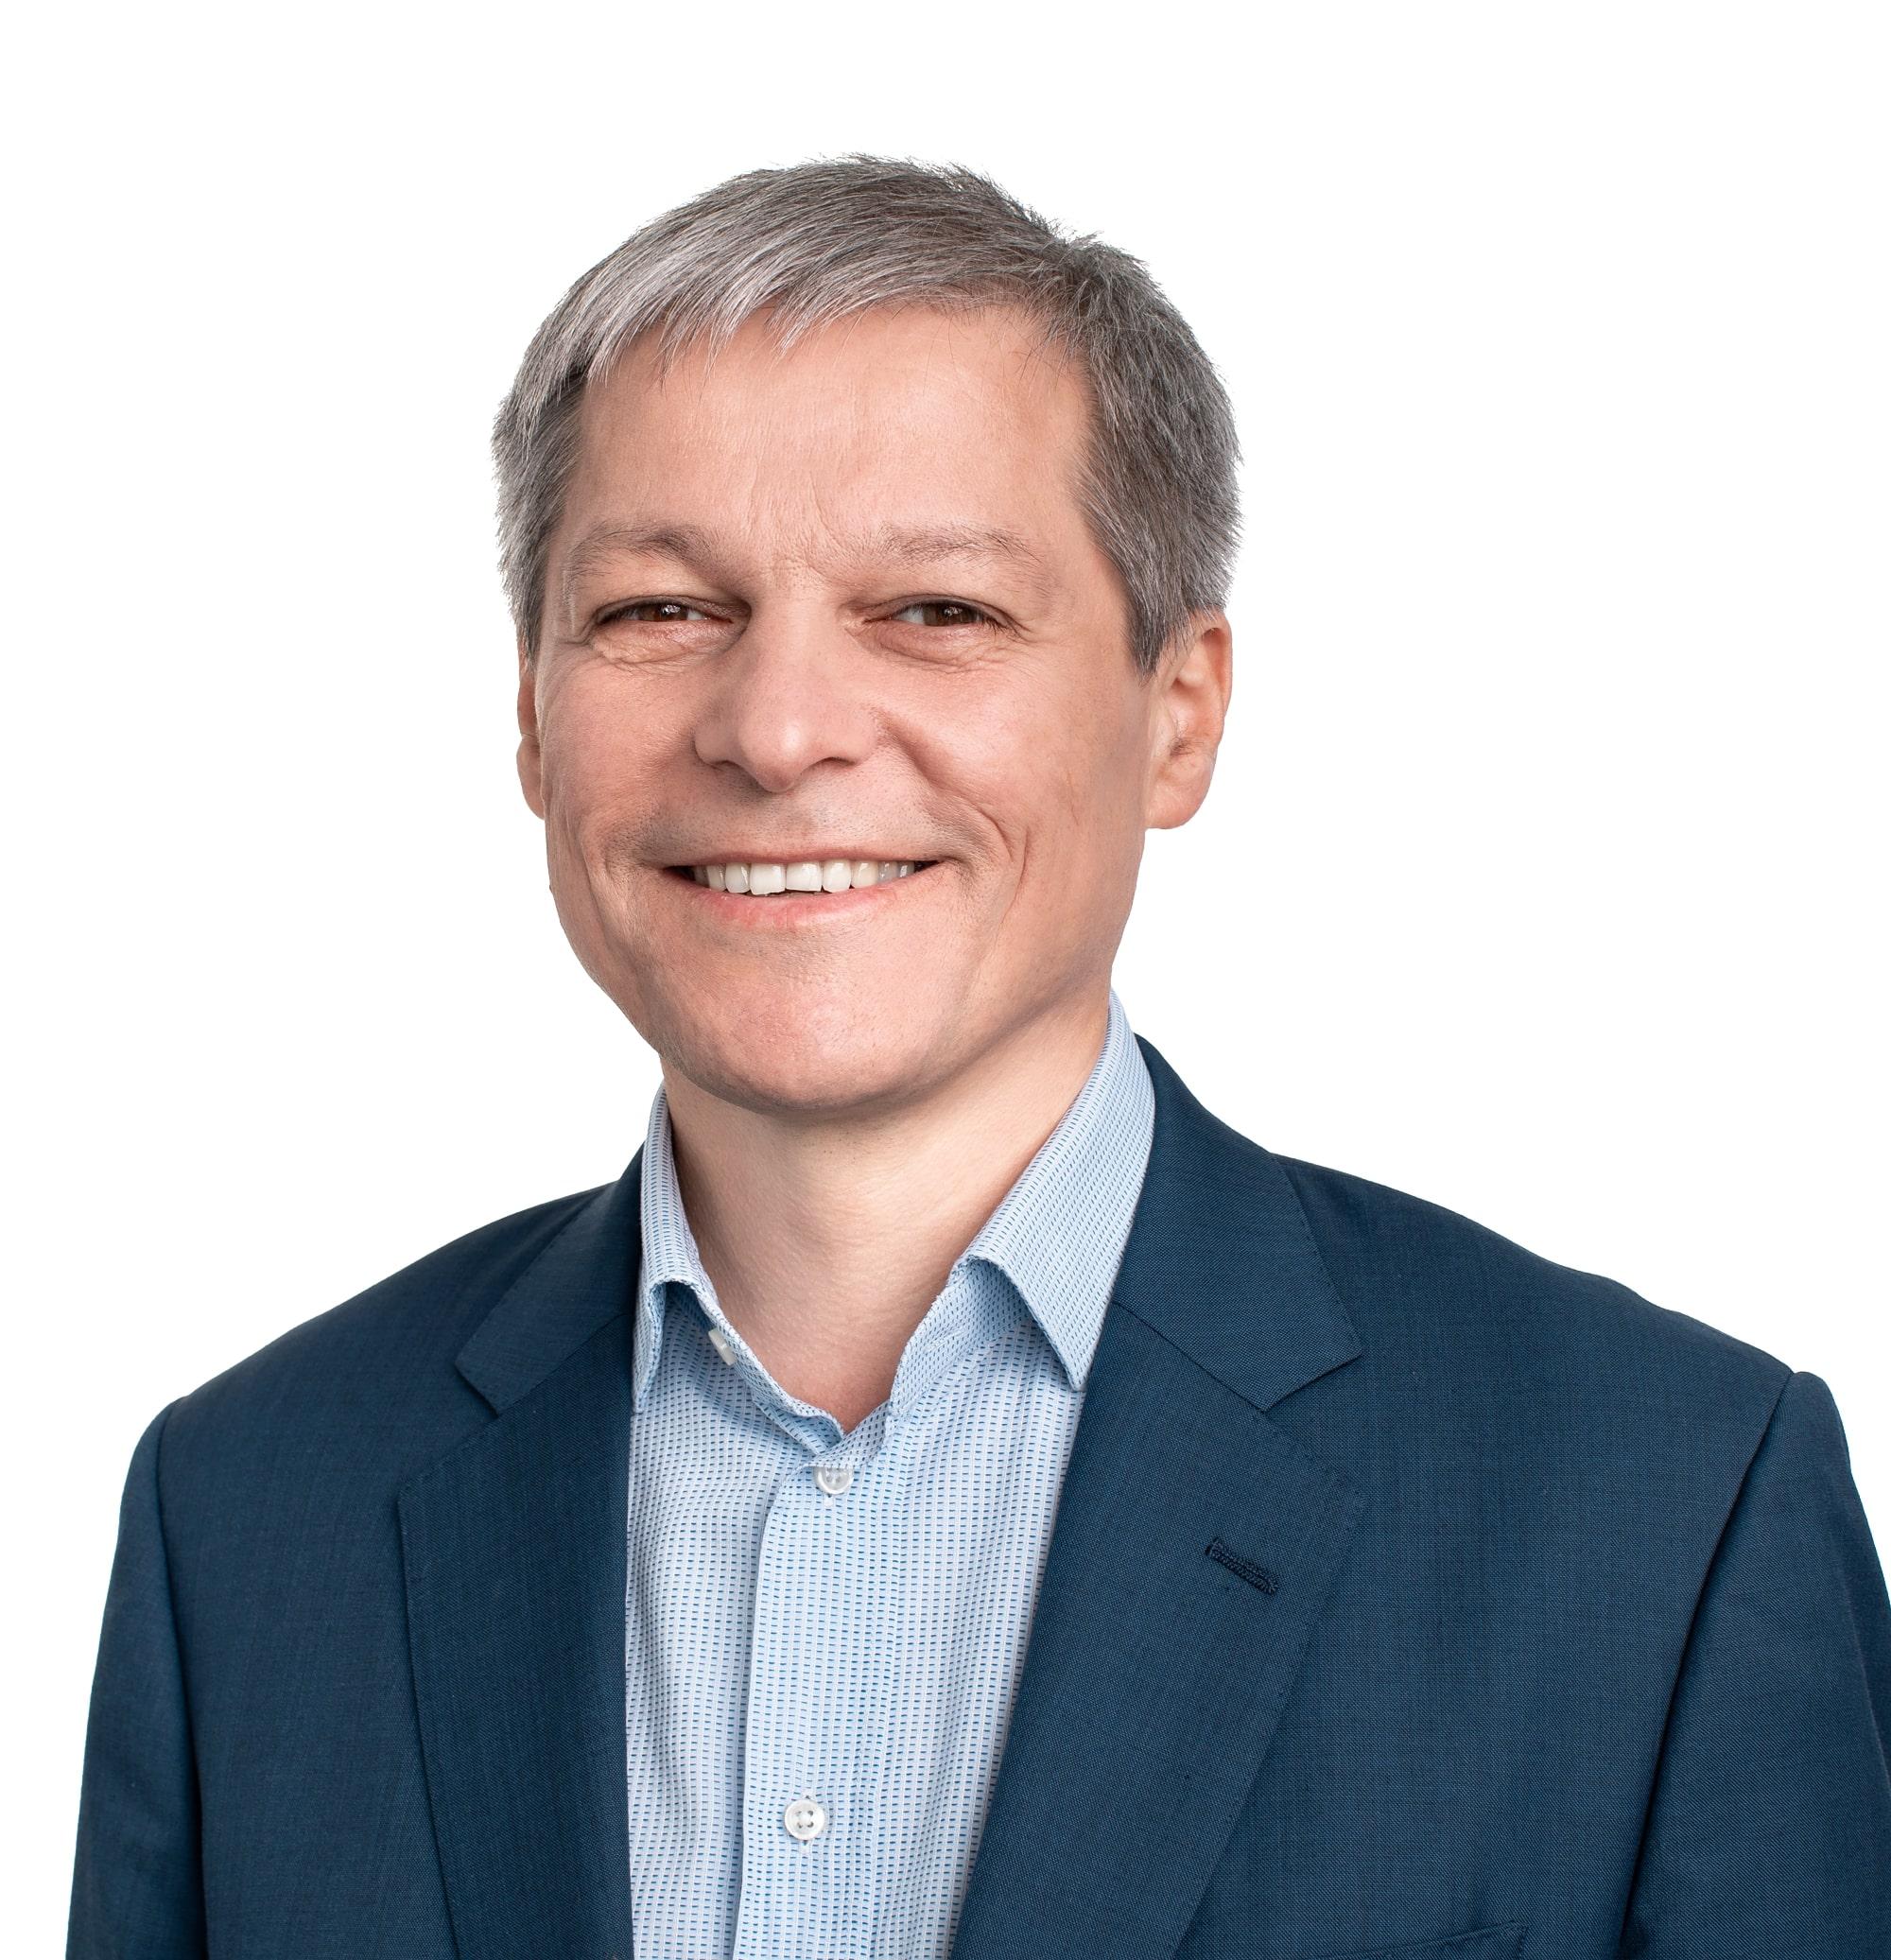 Dacian Cioloș, premier după 6 Decembrie? – Biz Brasov